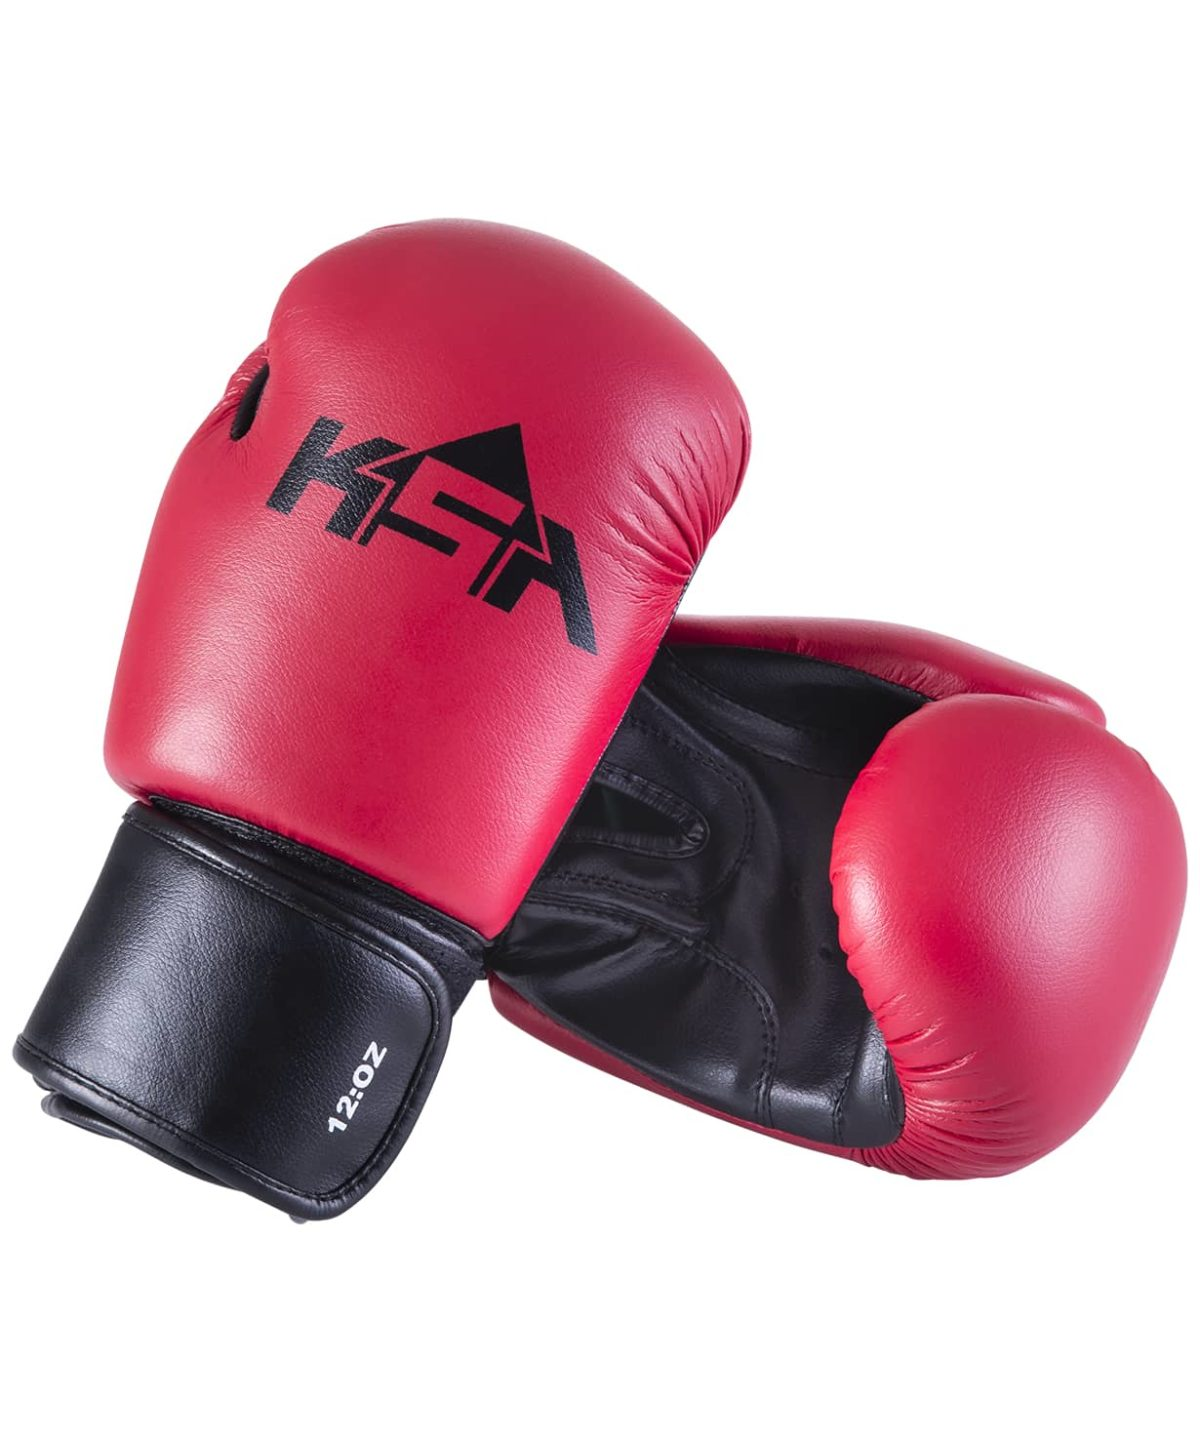 KSA Spider Red Перчатки боксерские, 6 oz, к/з 17810 - 1